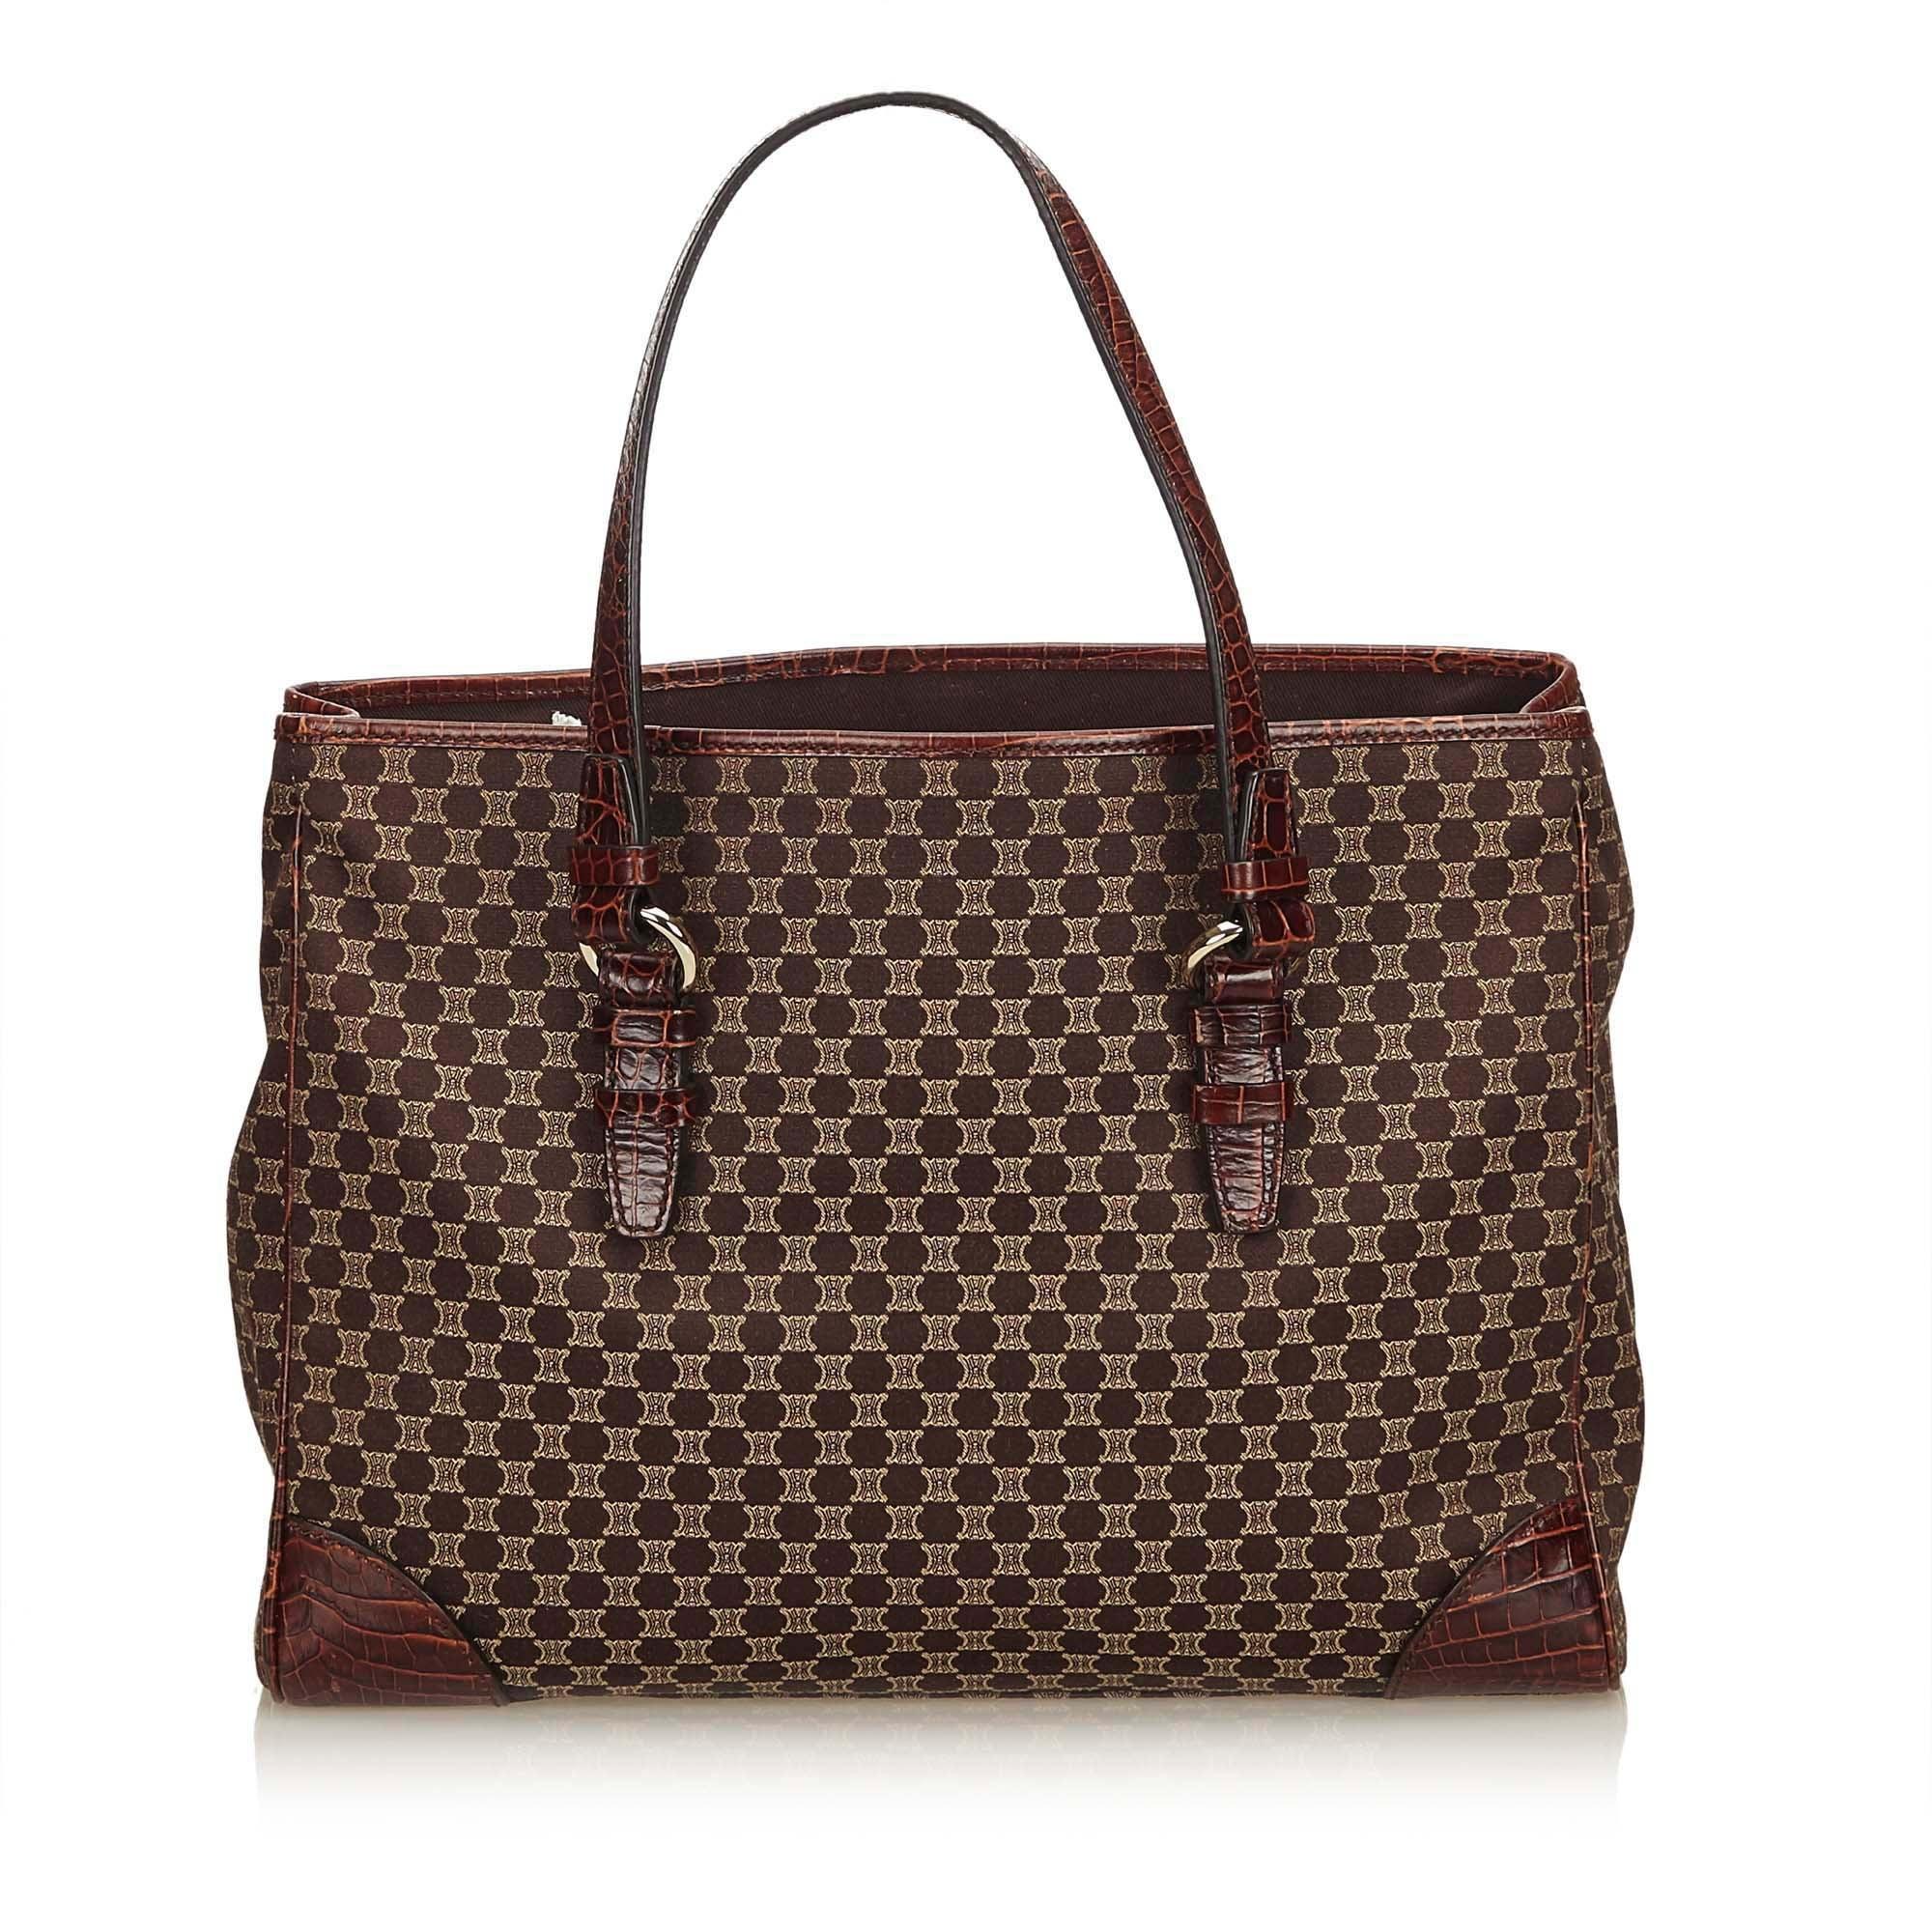 Celine Brown Macadam Jacquard Tote Bag at 1stdibs 814bbf53f7255